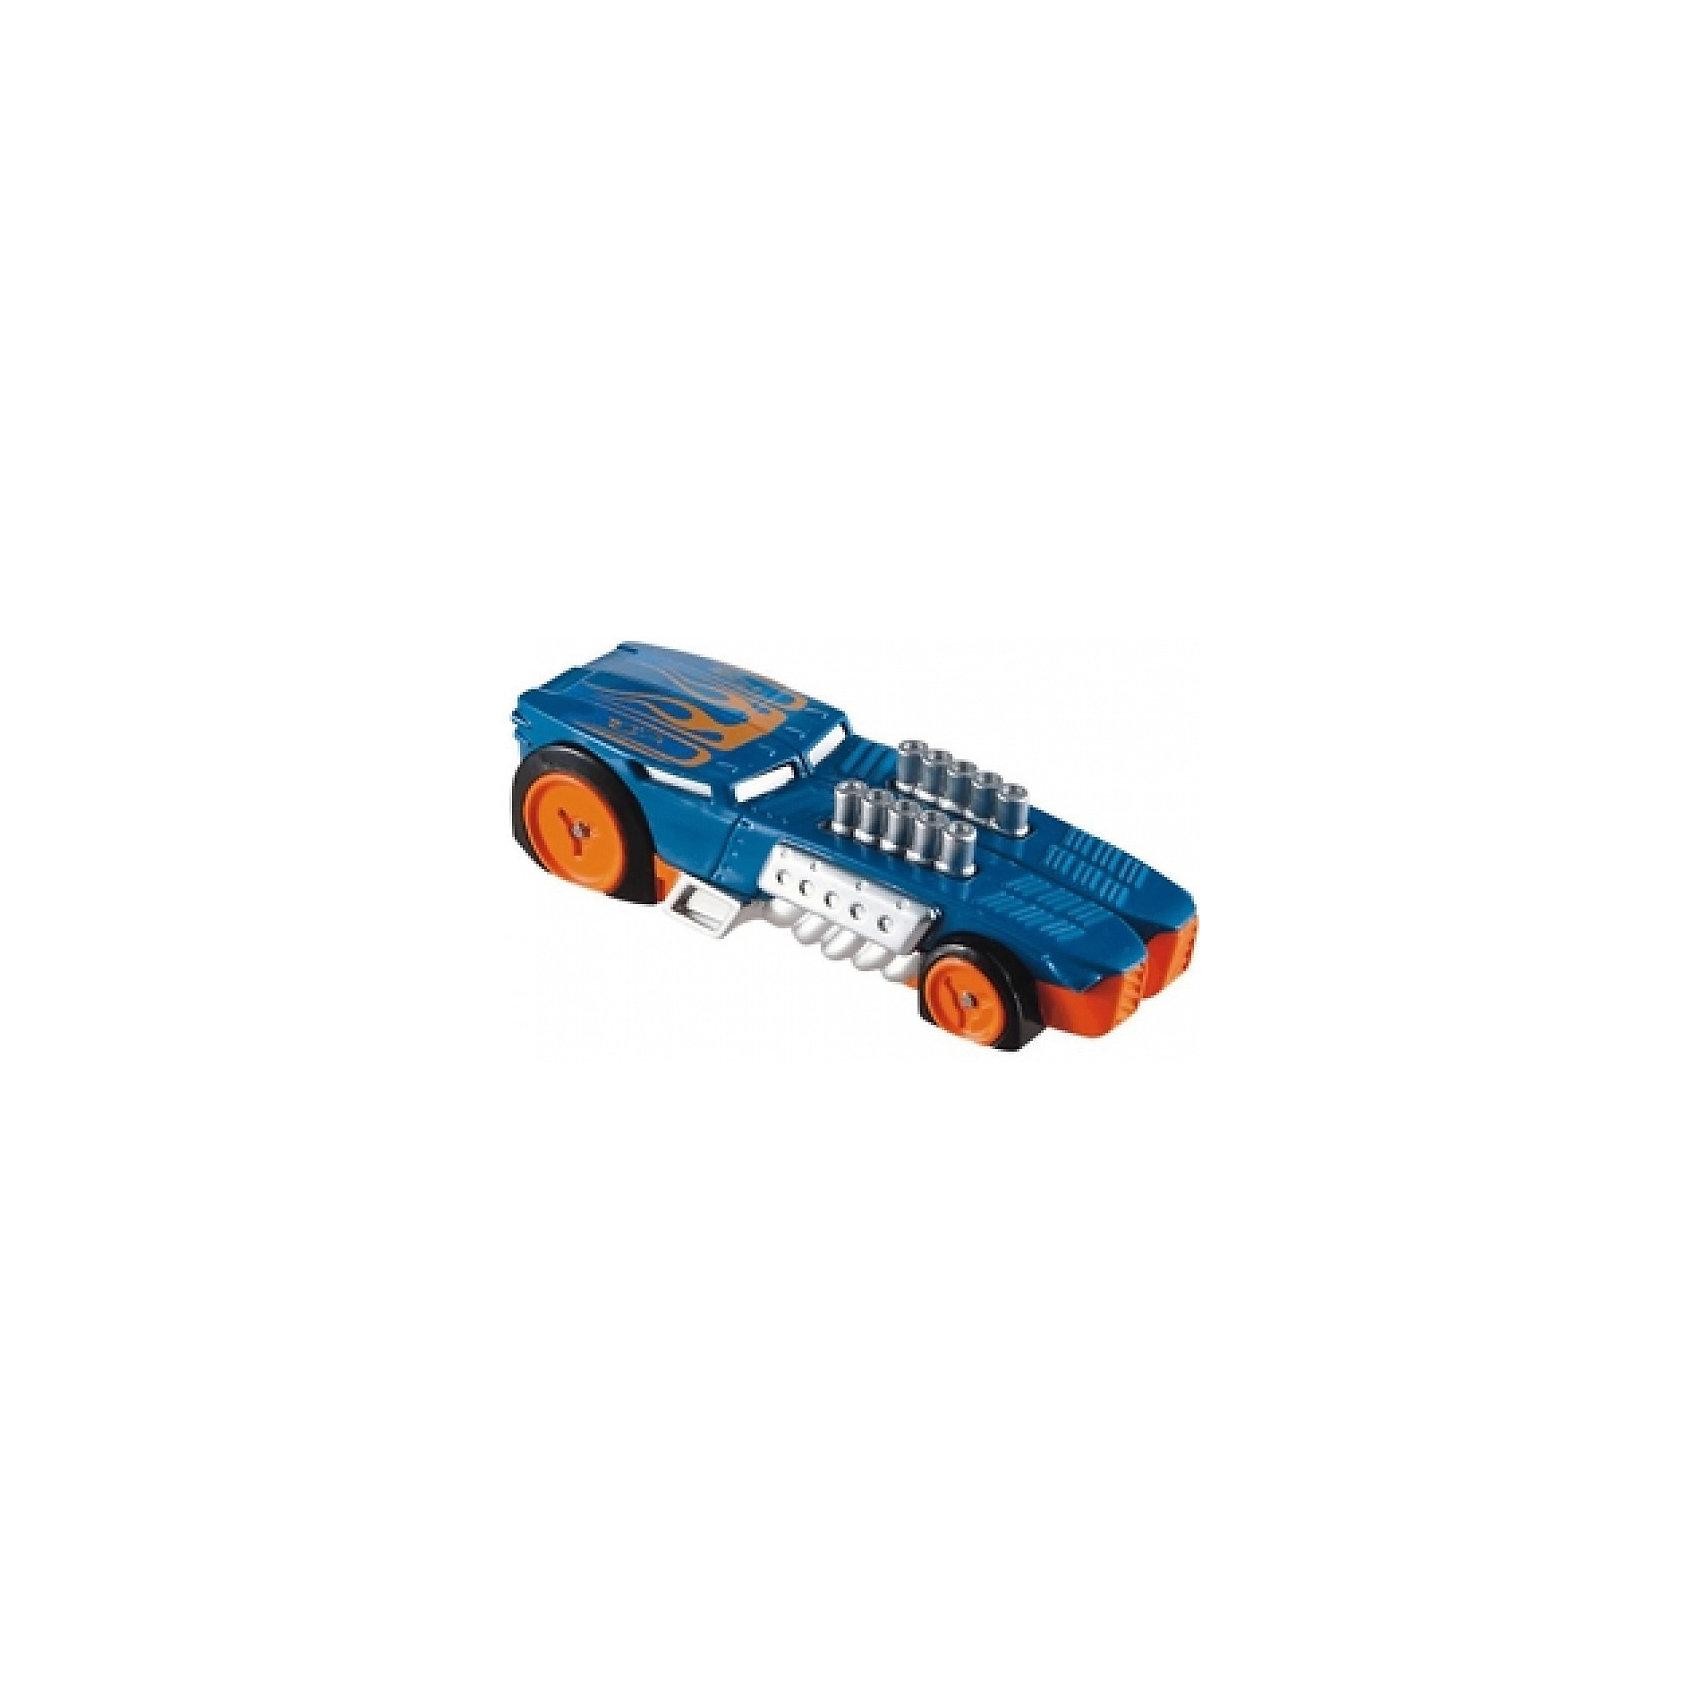 Mattel Машинка Разделяющиеся гонщики, Hot Wheels машинки toystate машинка toystate